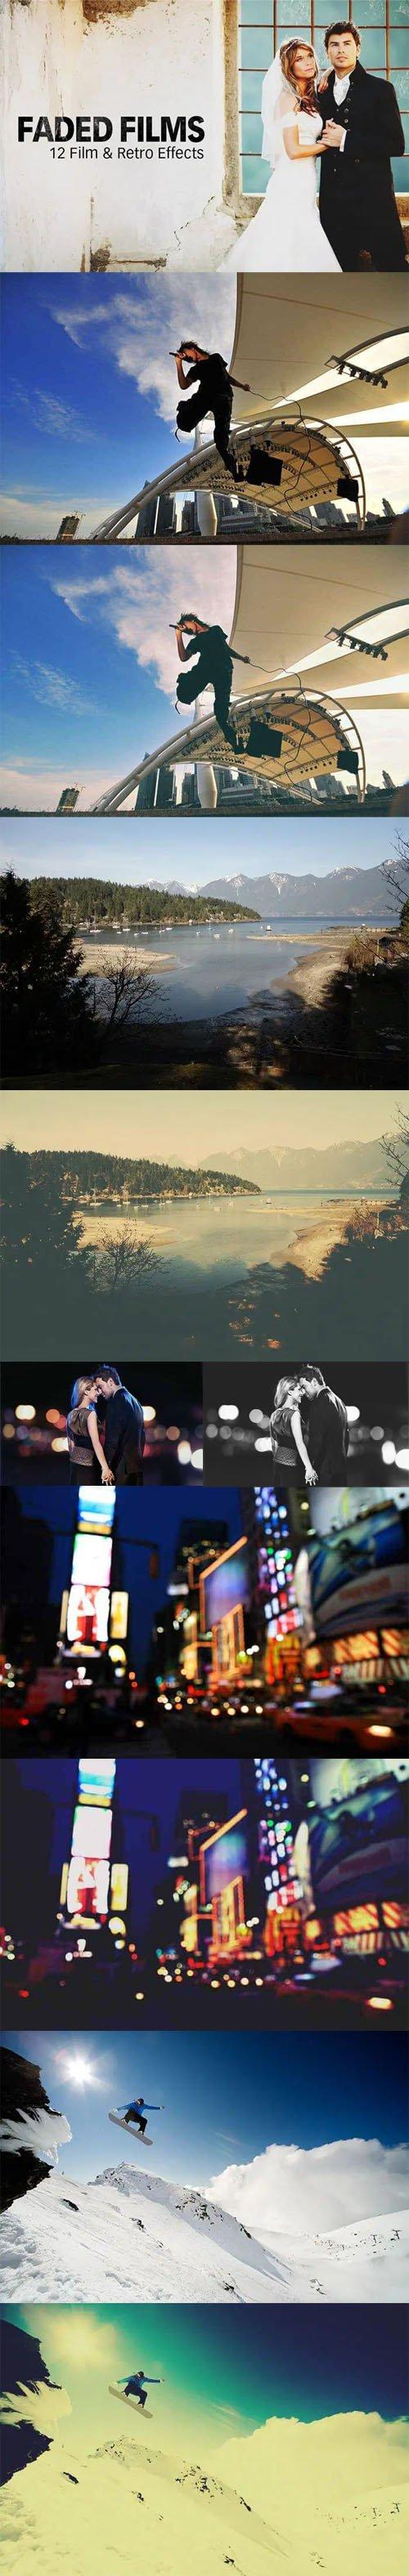 12 Film & Retro Effects - Instagram & Prestalgia Faded Film Actions for Photoshop